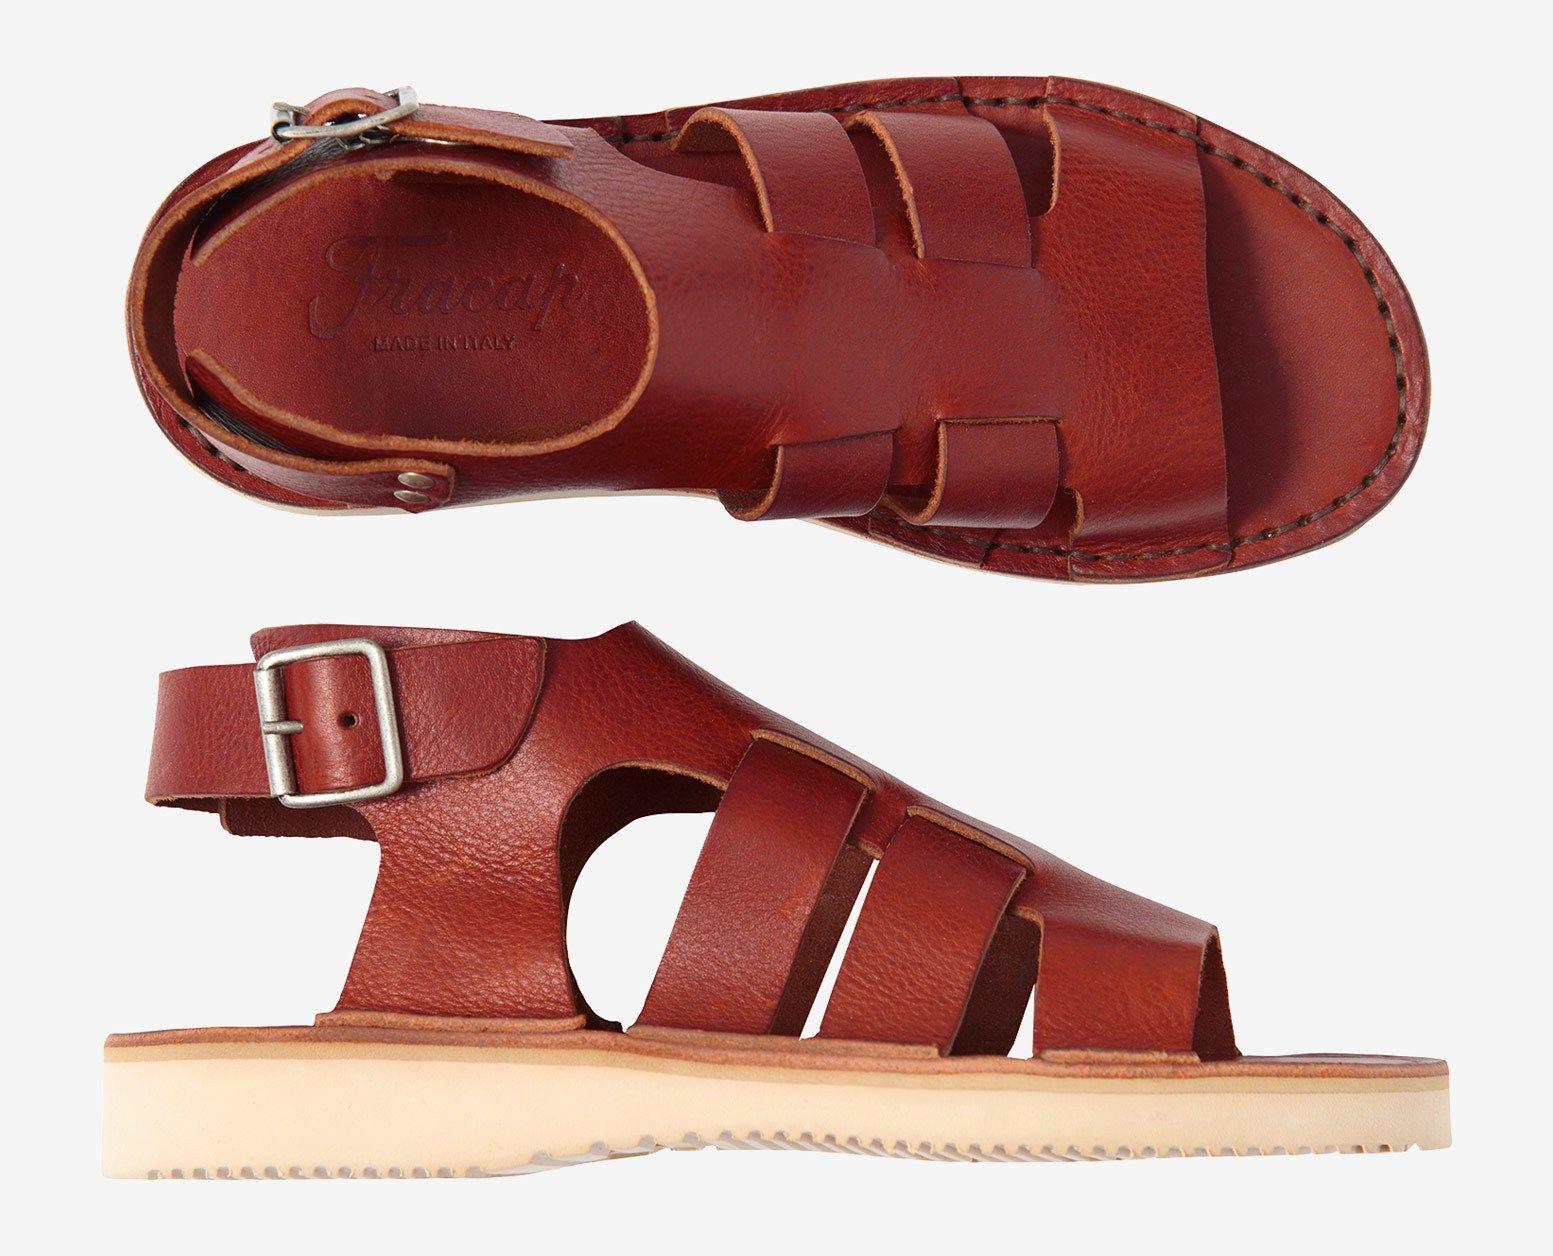 7d16460b3ba67 Fracap Gladiator Sandals in 2019